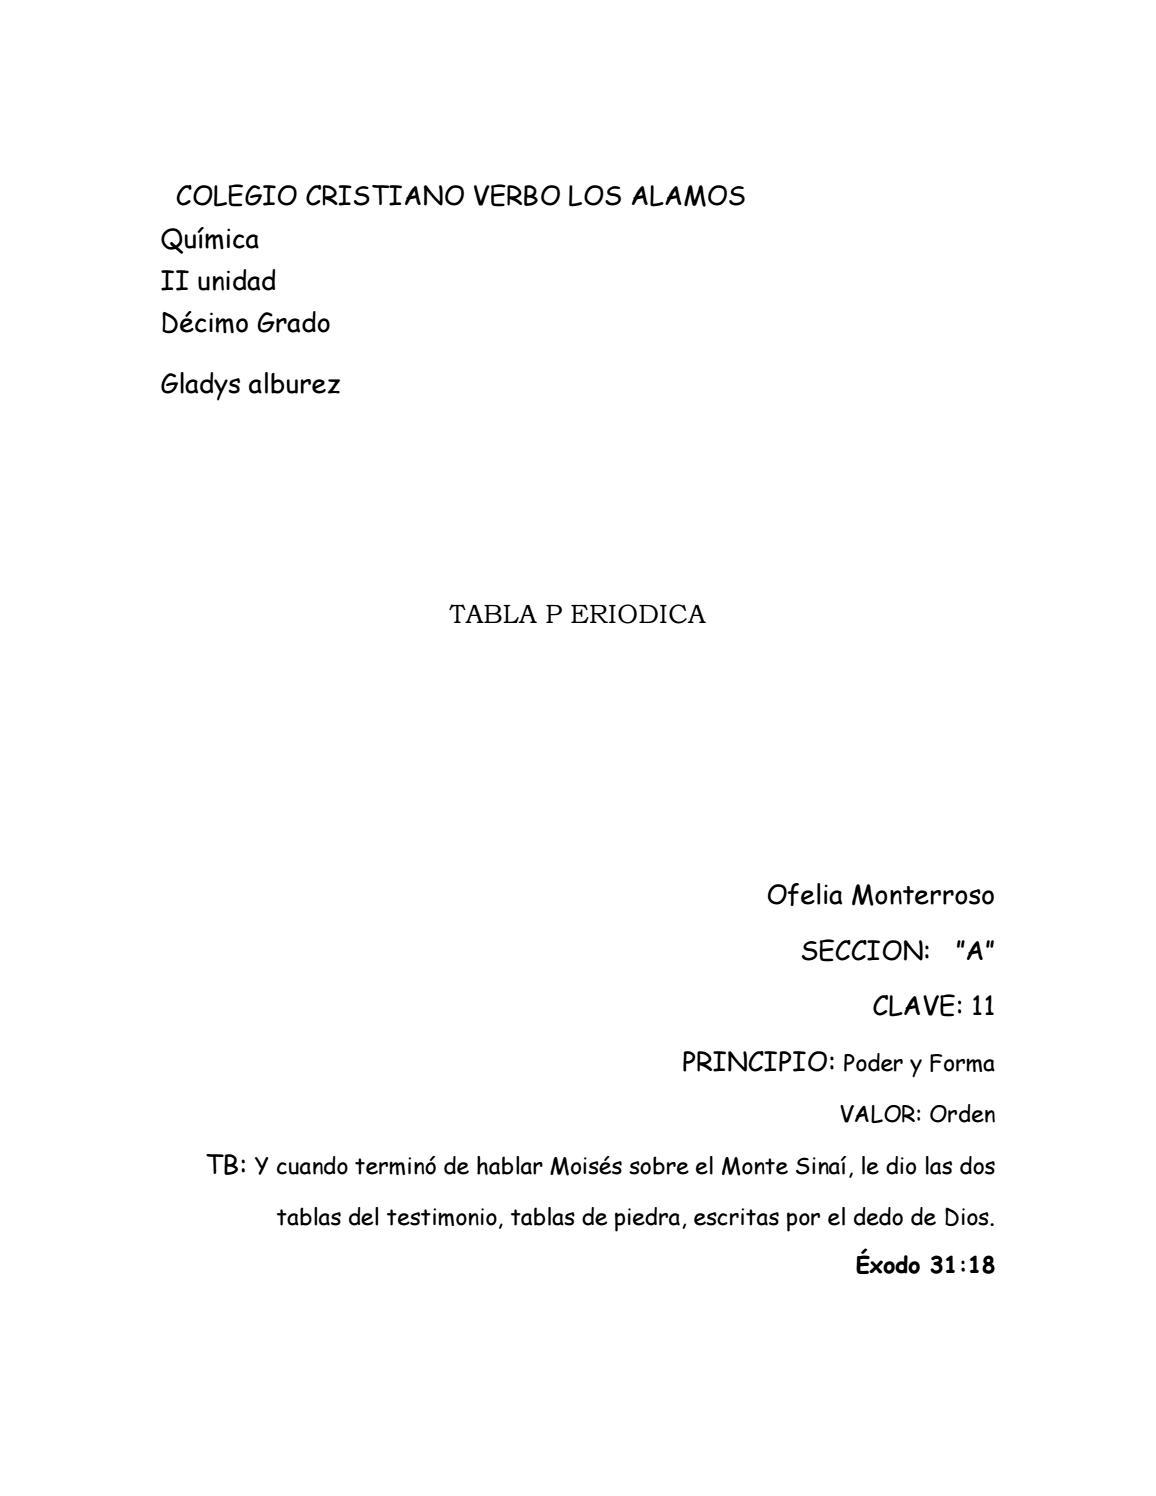 Tabla periodica by ofelia issuu urtaz Image collections